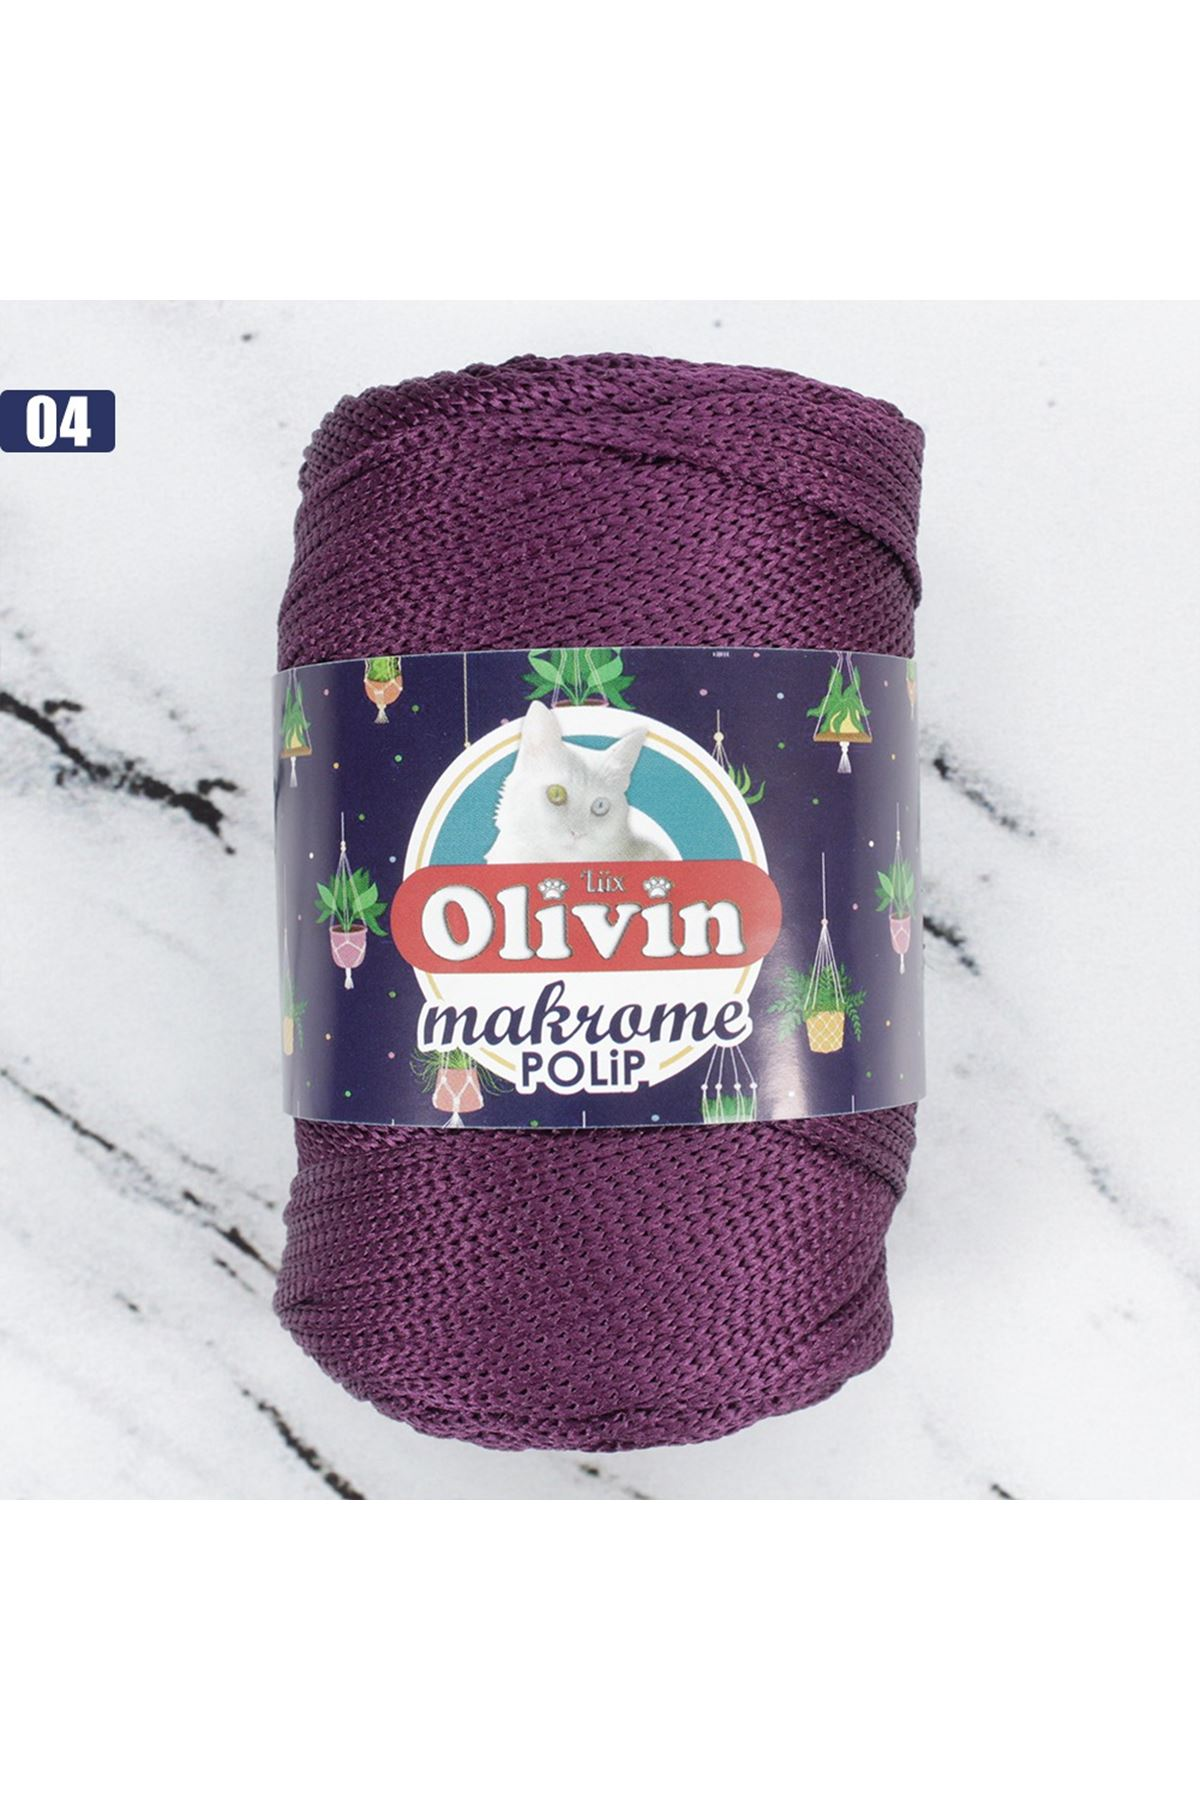 Olivin Makrome Polip 04